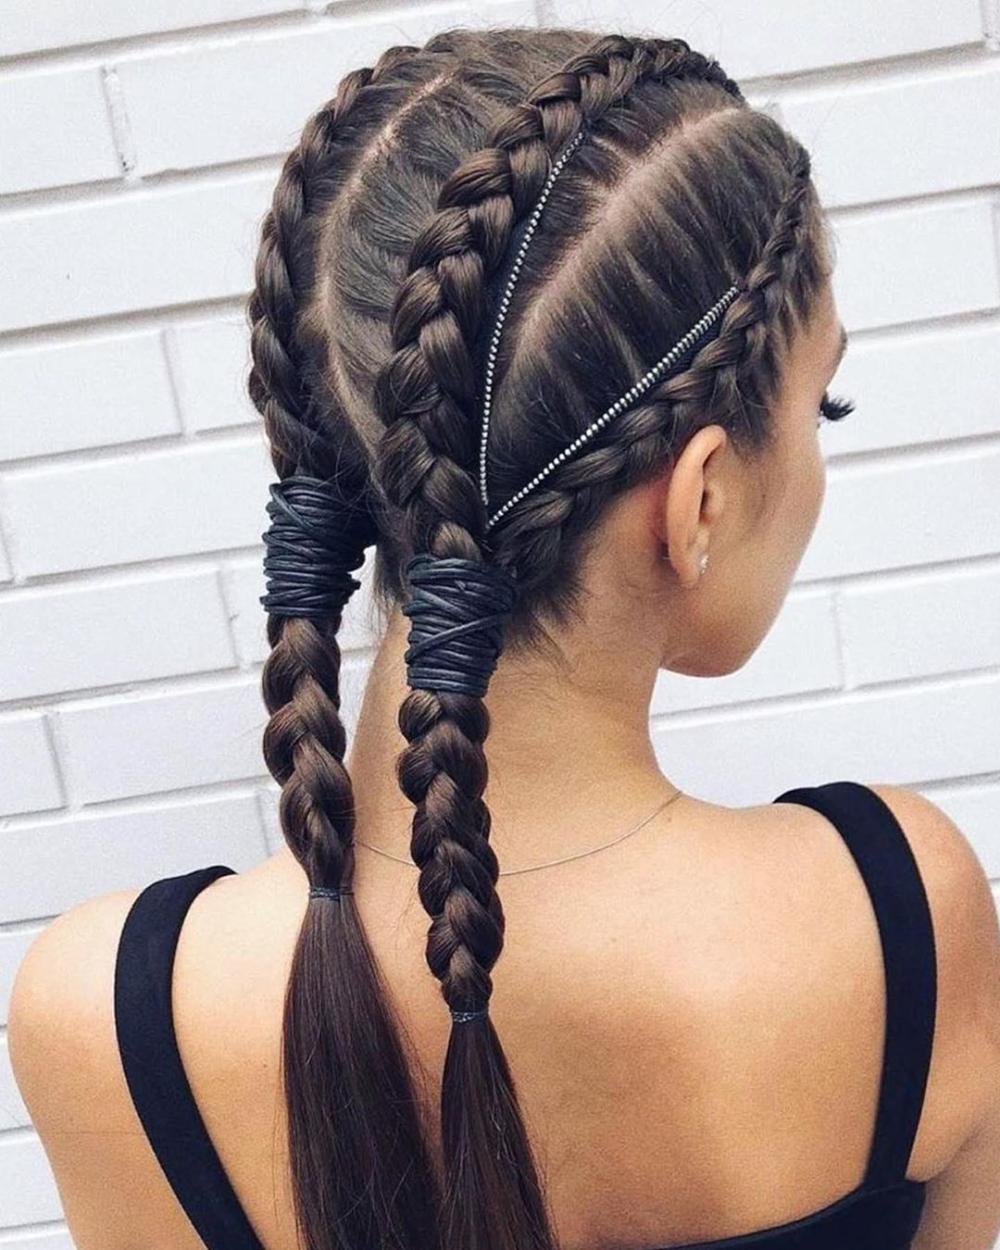 Hair Video Hair2pearl Instagram Photos And Videos Braids For Long Hair Braided Ponytail Hairstyles Hair Styles